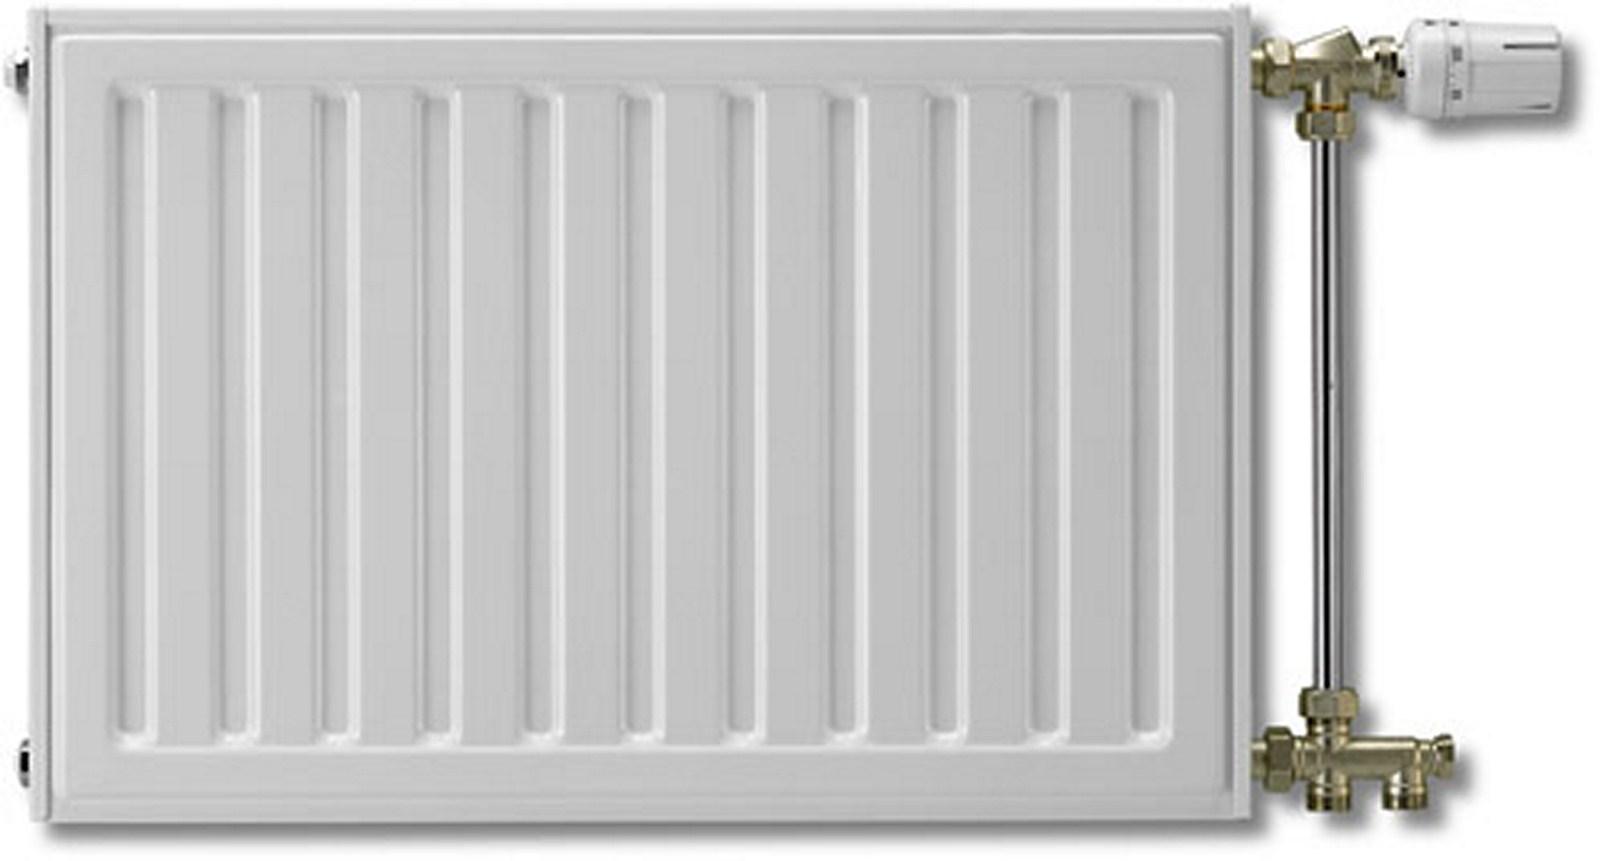 Chauffage radiateur panneaux radson radiateur compact for Prix radiateur chauffage central